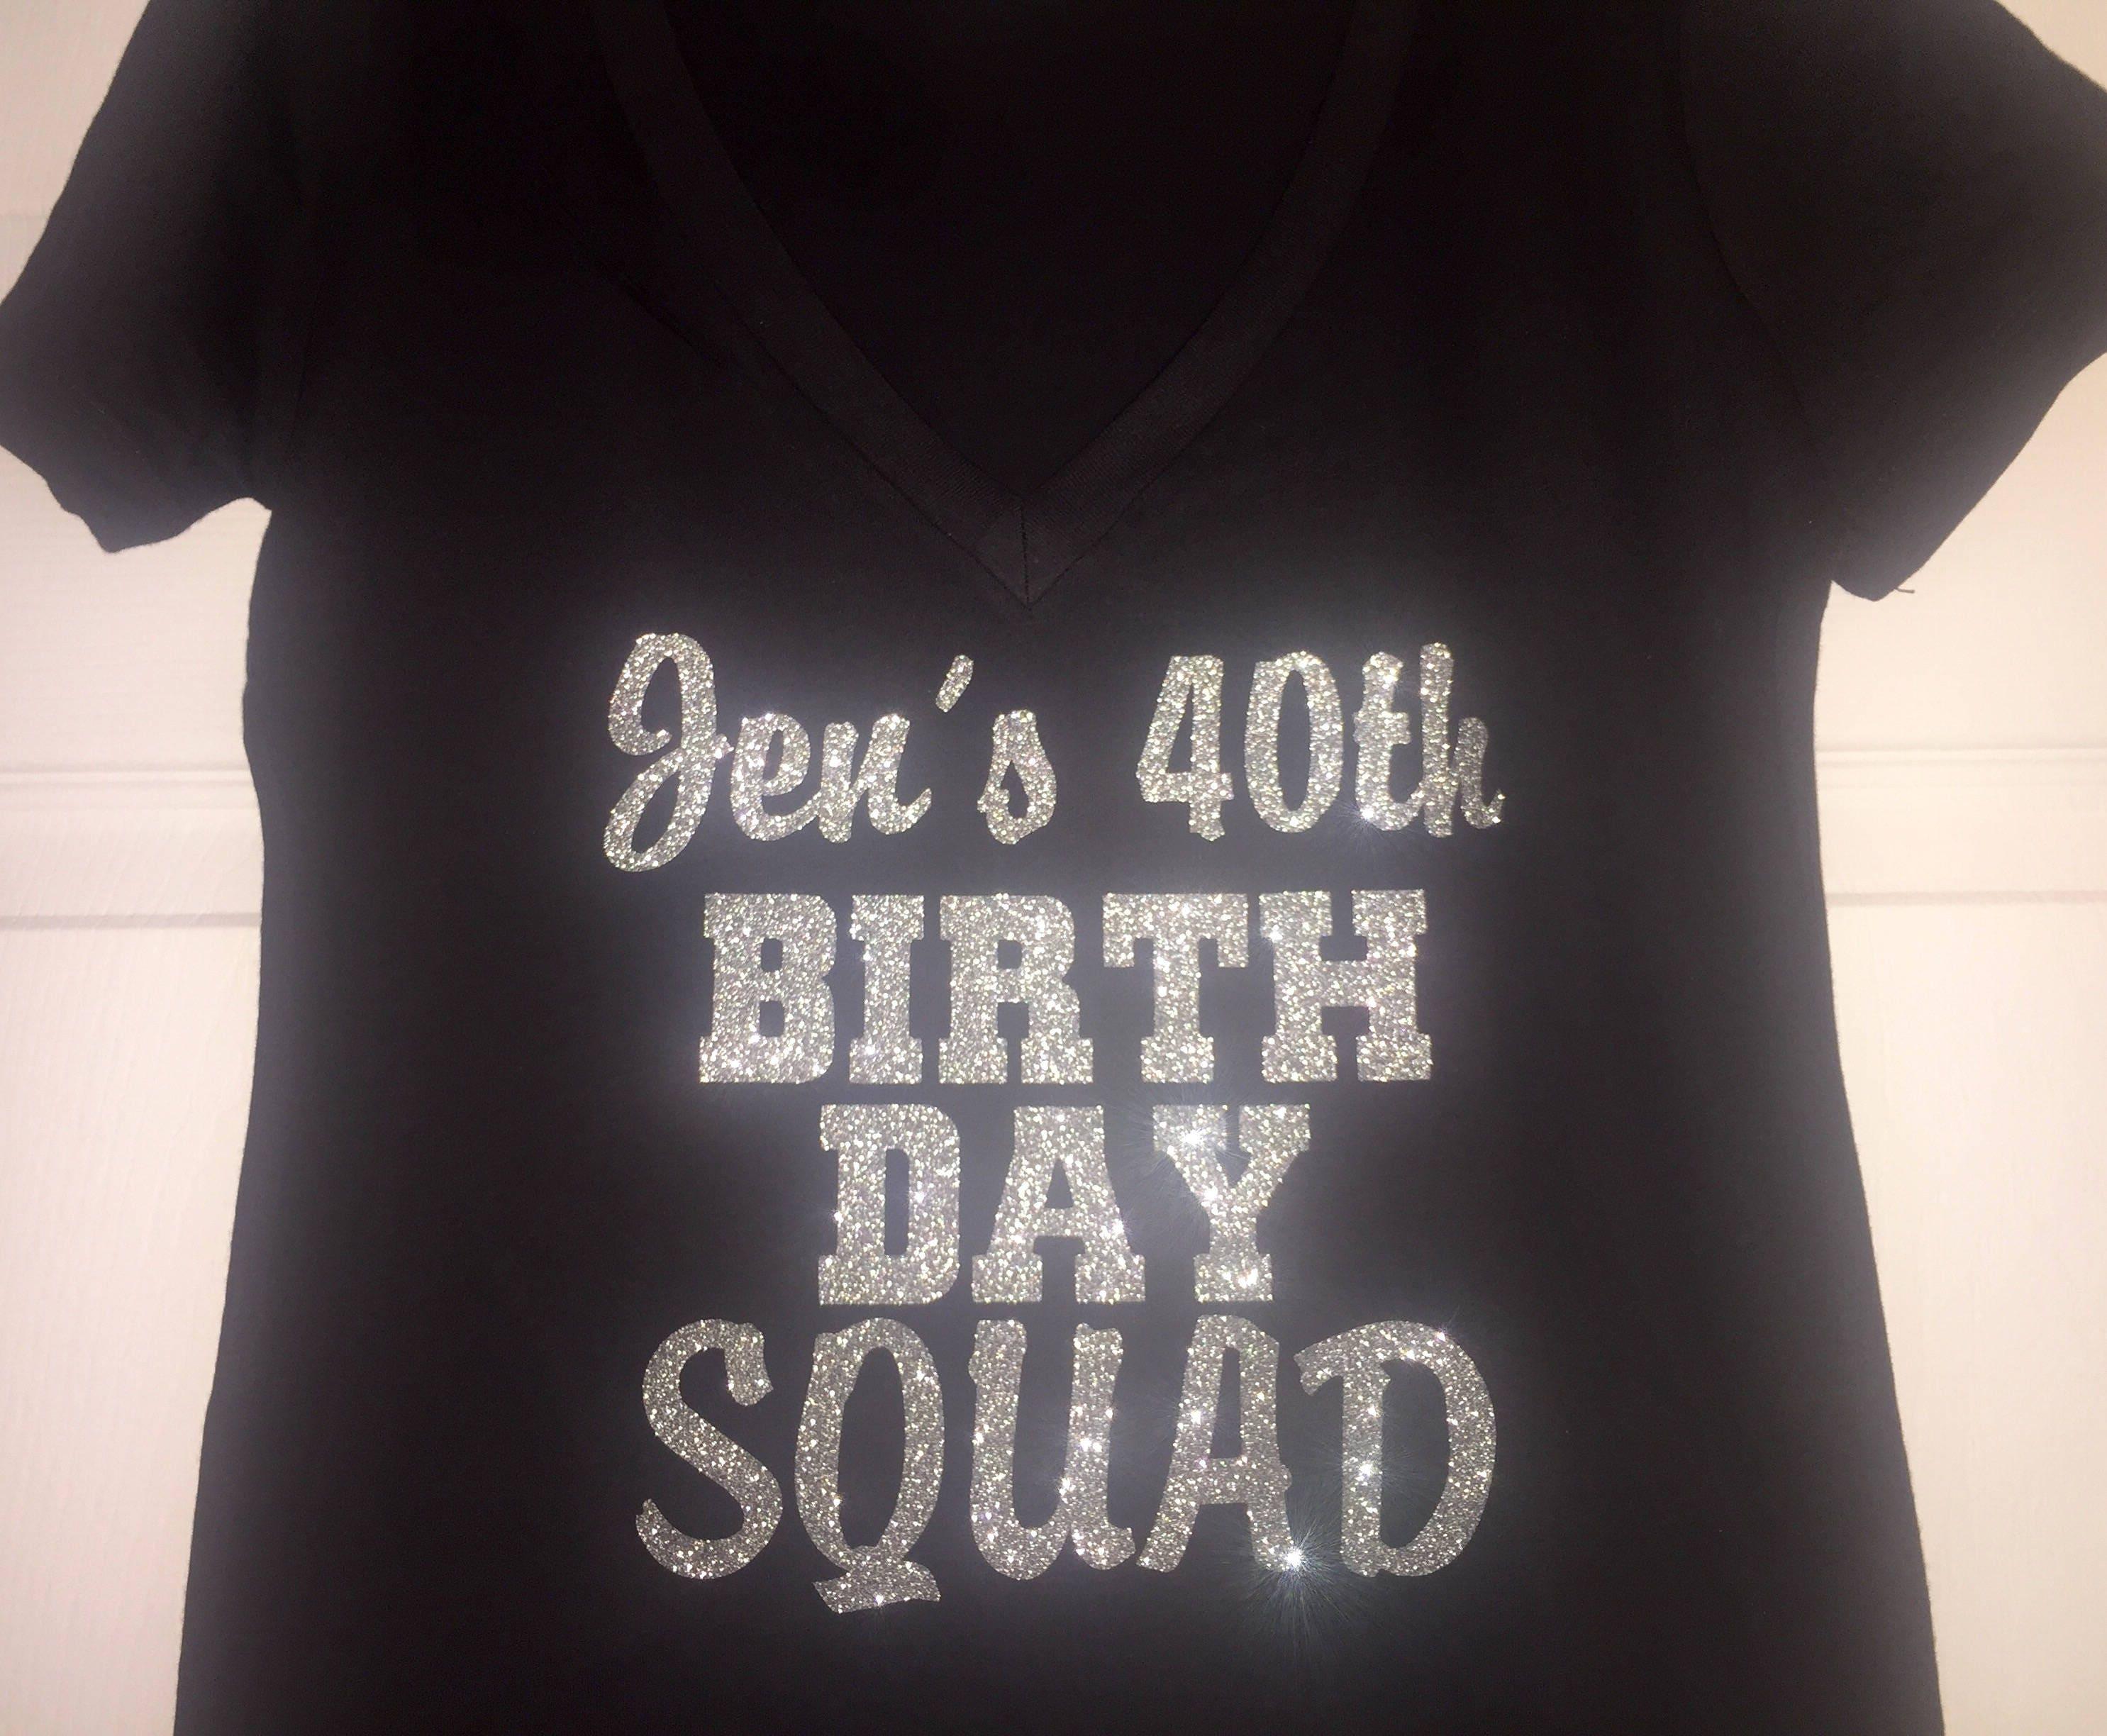 1c7864ced Ladies fifty birthday tshirts personalized . gallery photo gallery photo  gallery photo gallery photo gallery photo gallery photo gallery photo ...